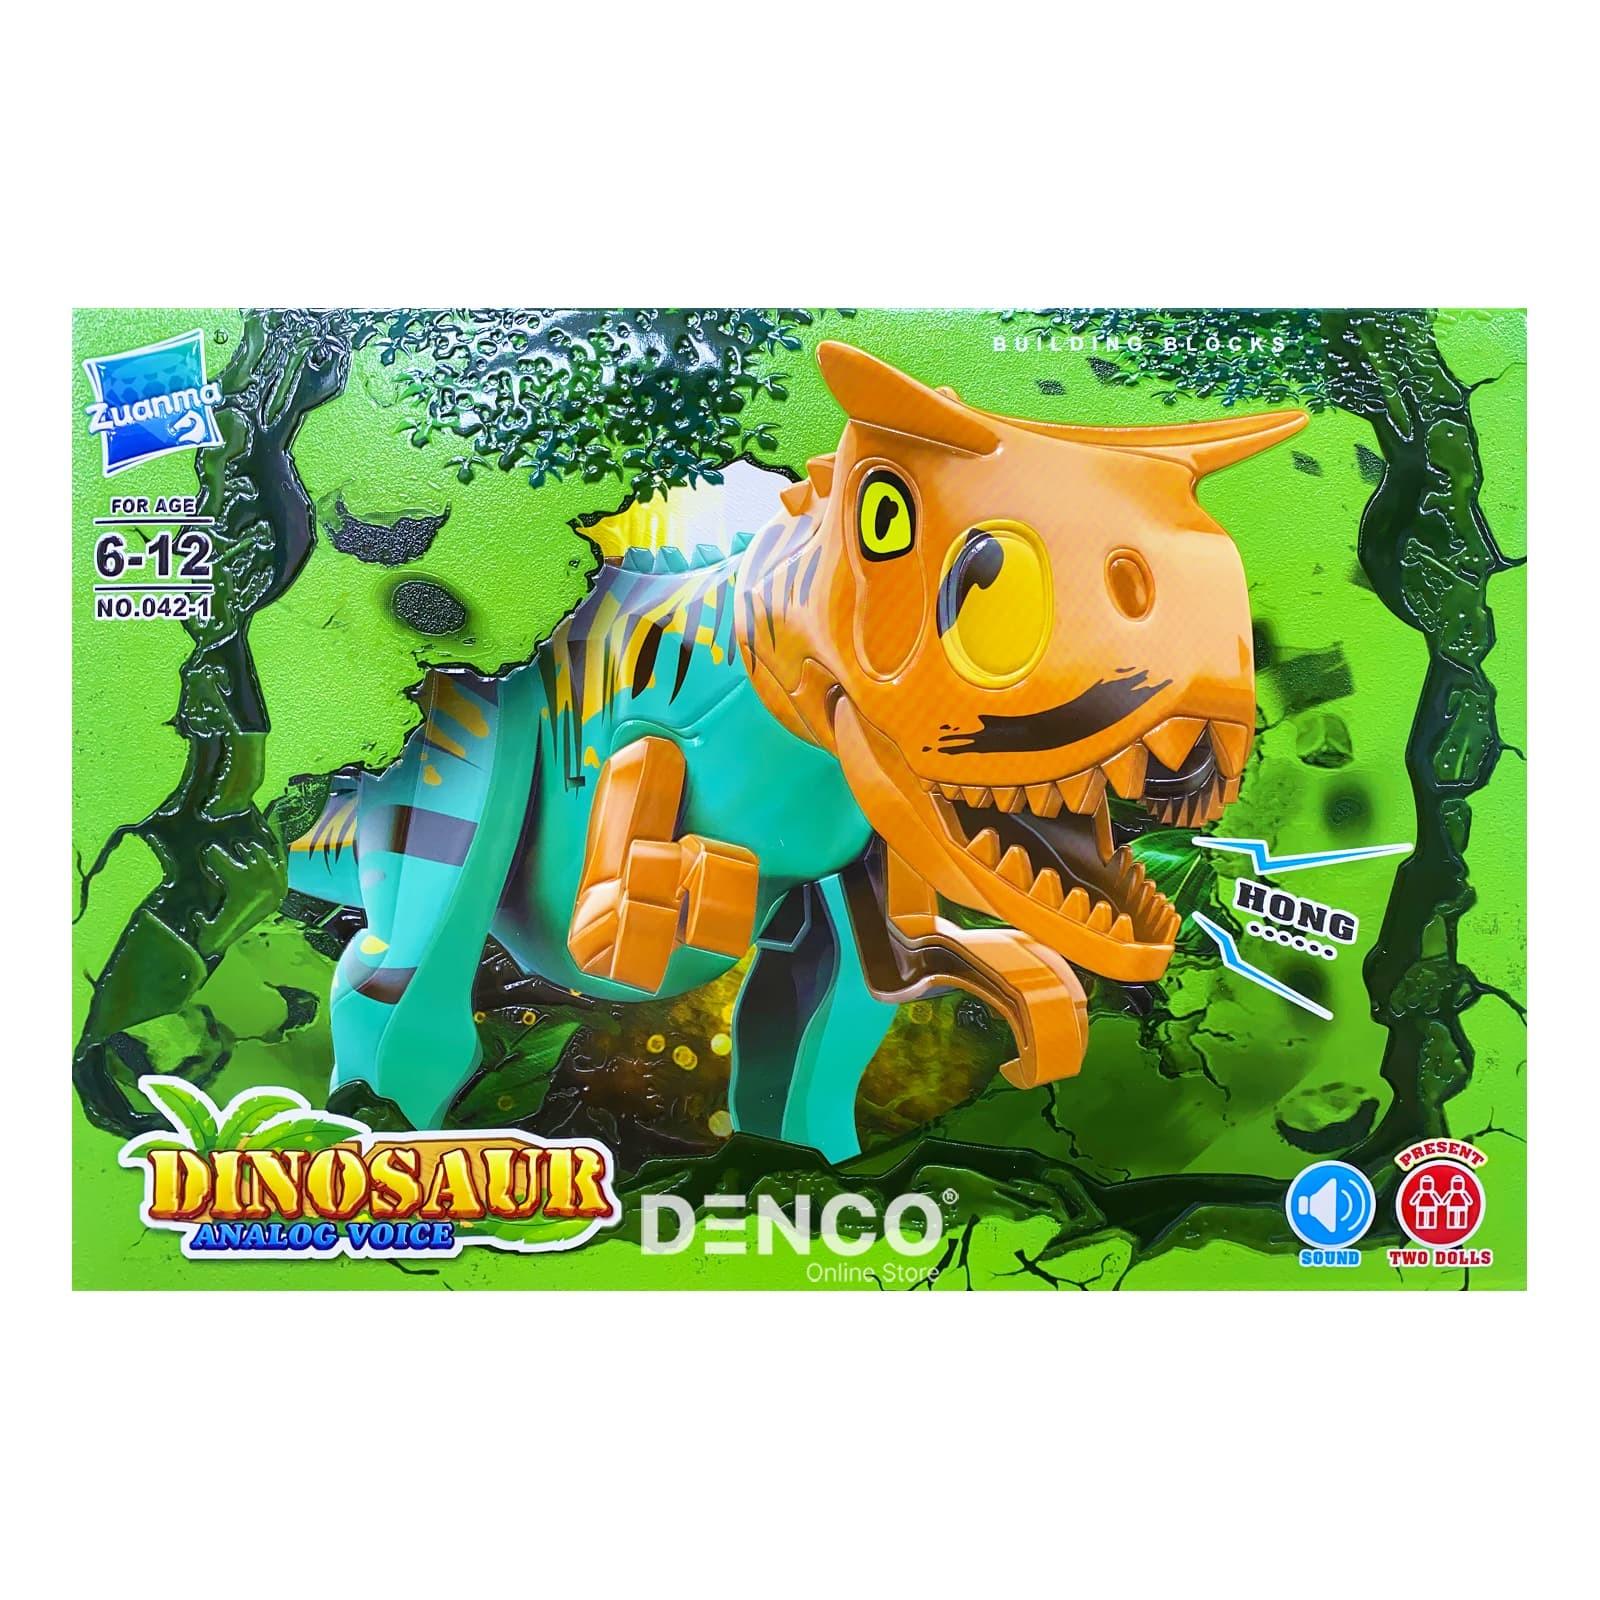 Конструктор Zuanma Парк Юрского периода (Jurassic World) «Карнотавр» со звуком 042-1